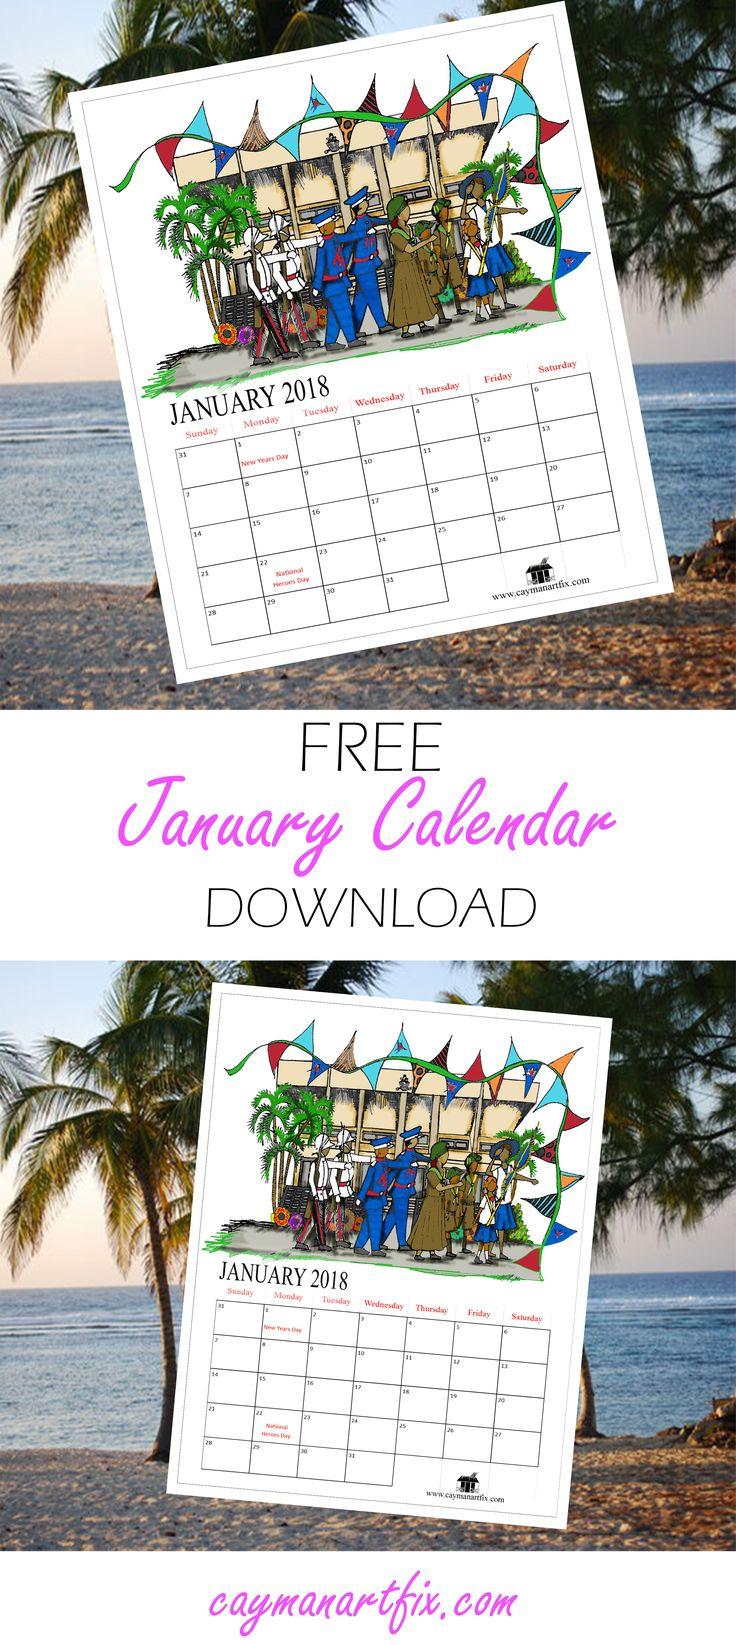 A January Calendar to enjoy! #HappyNewyear #calendar #january #2018 #printable #organiser #perfectforyourdesk #caymanartfix